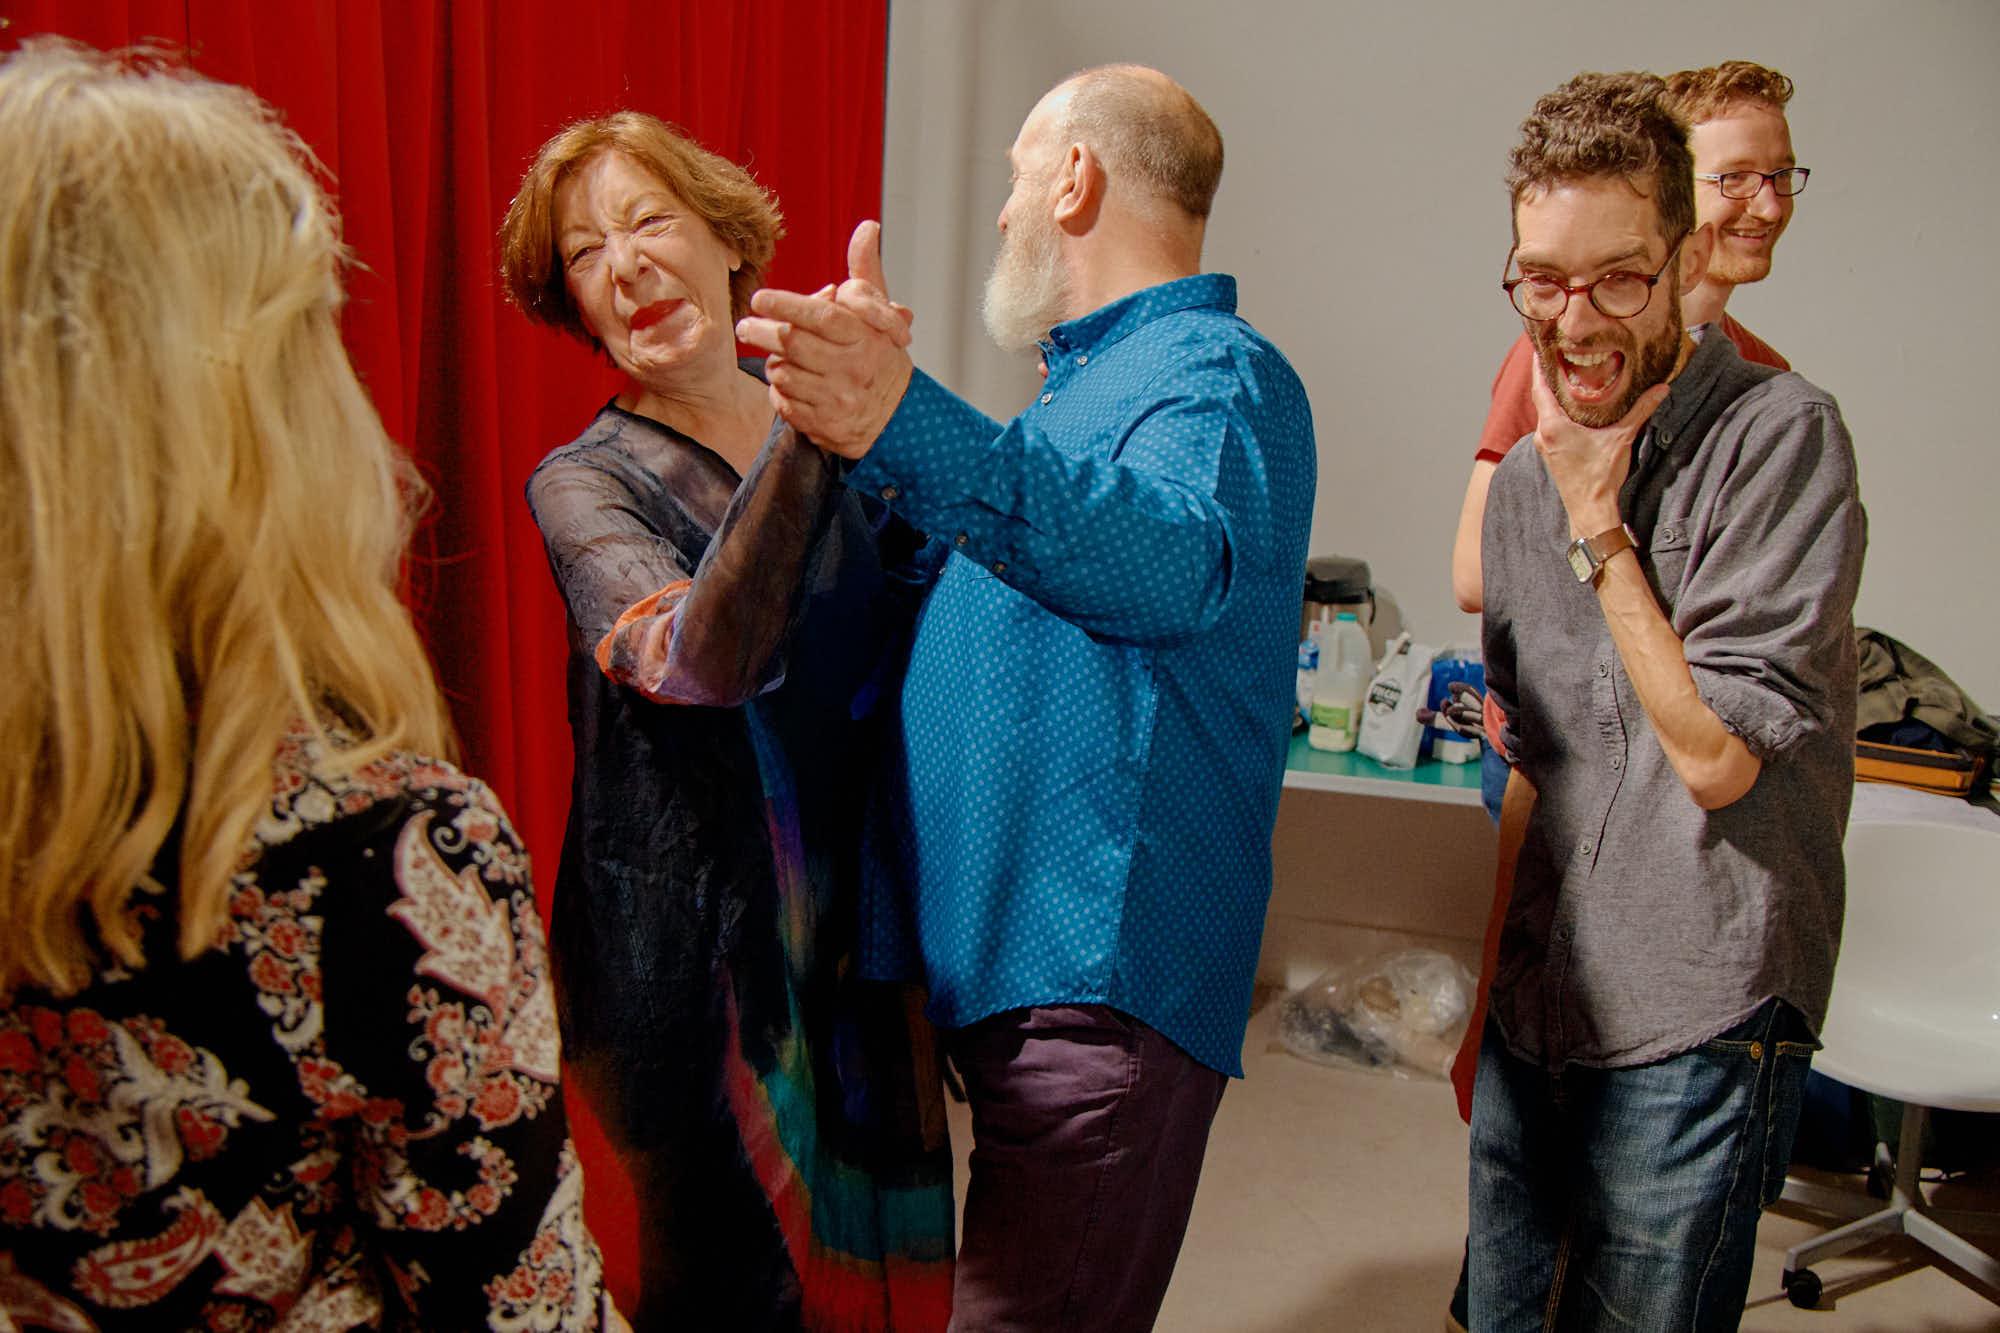 Cast Behind the Scenes _Frank & Mary Stills_ by Suzi Corker_03.jpg